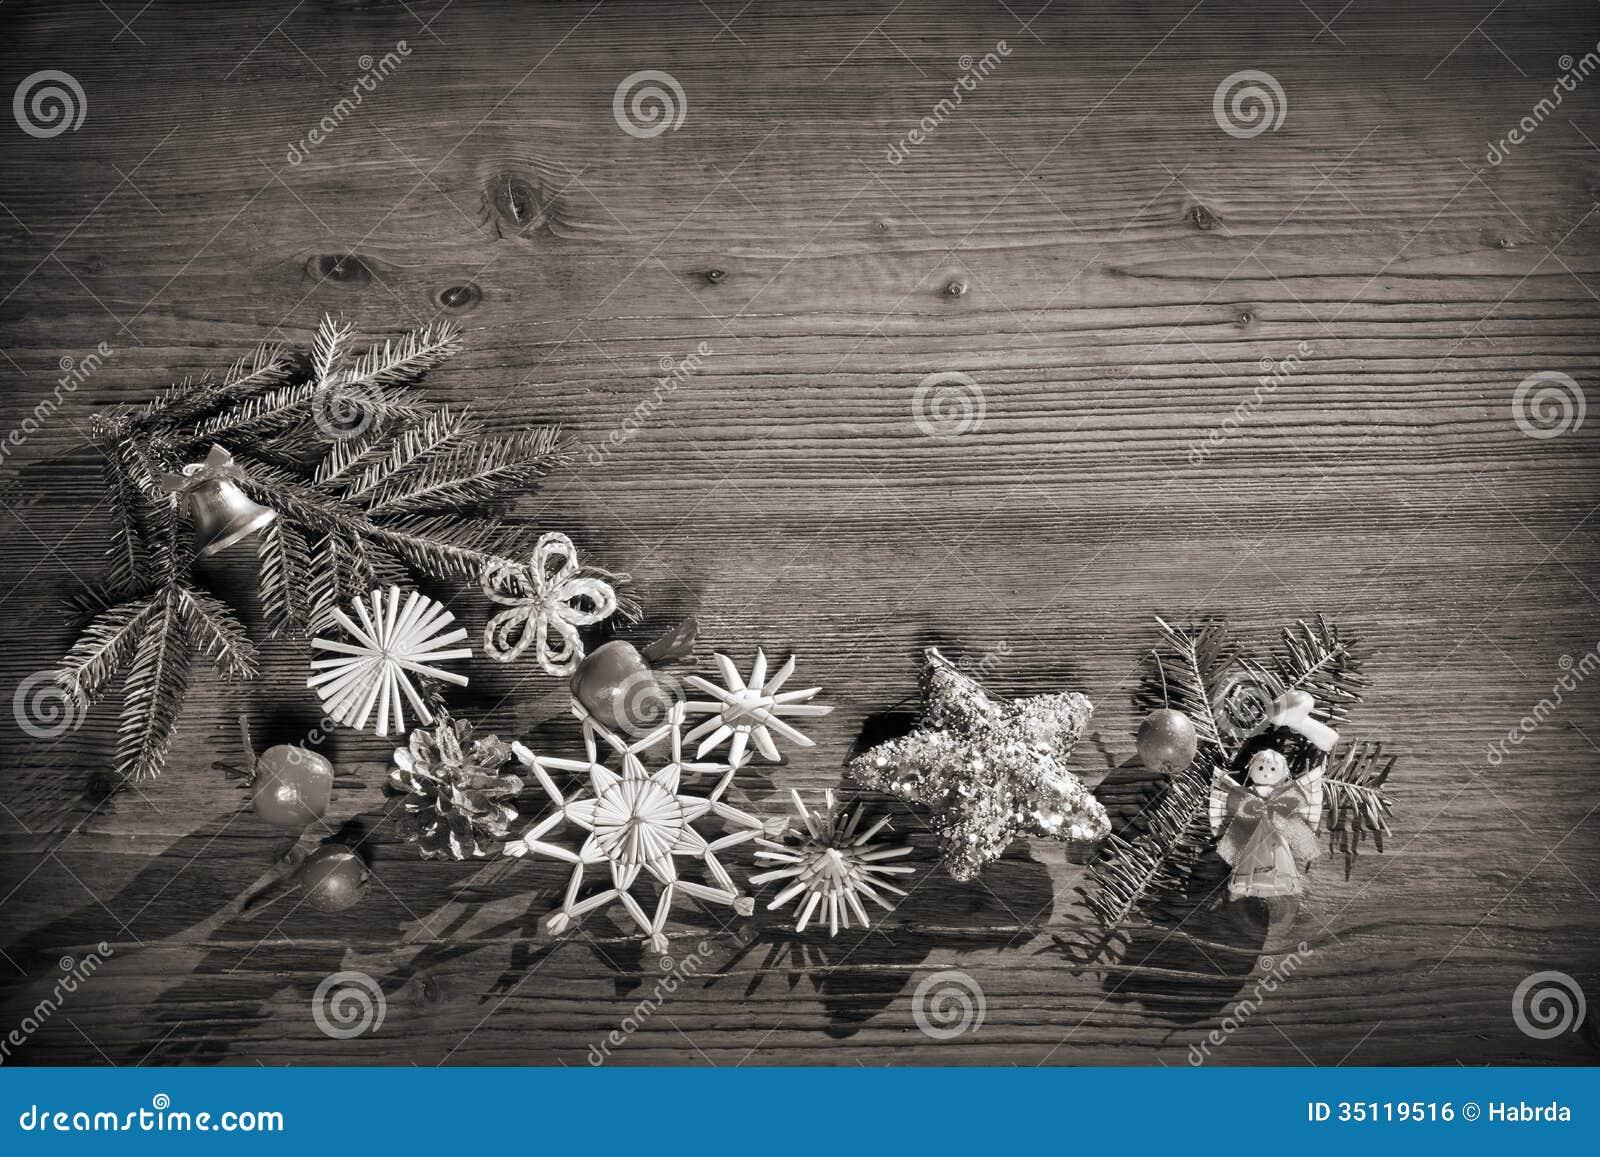 Christmas Background Black And White Stock Photo Image Of